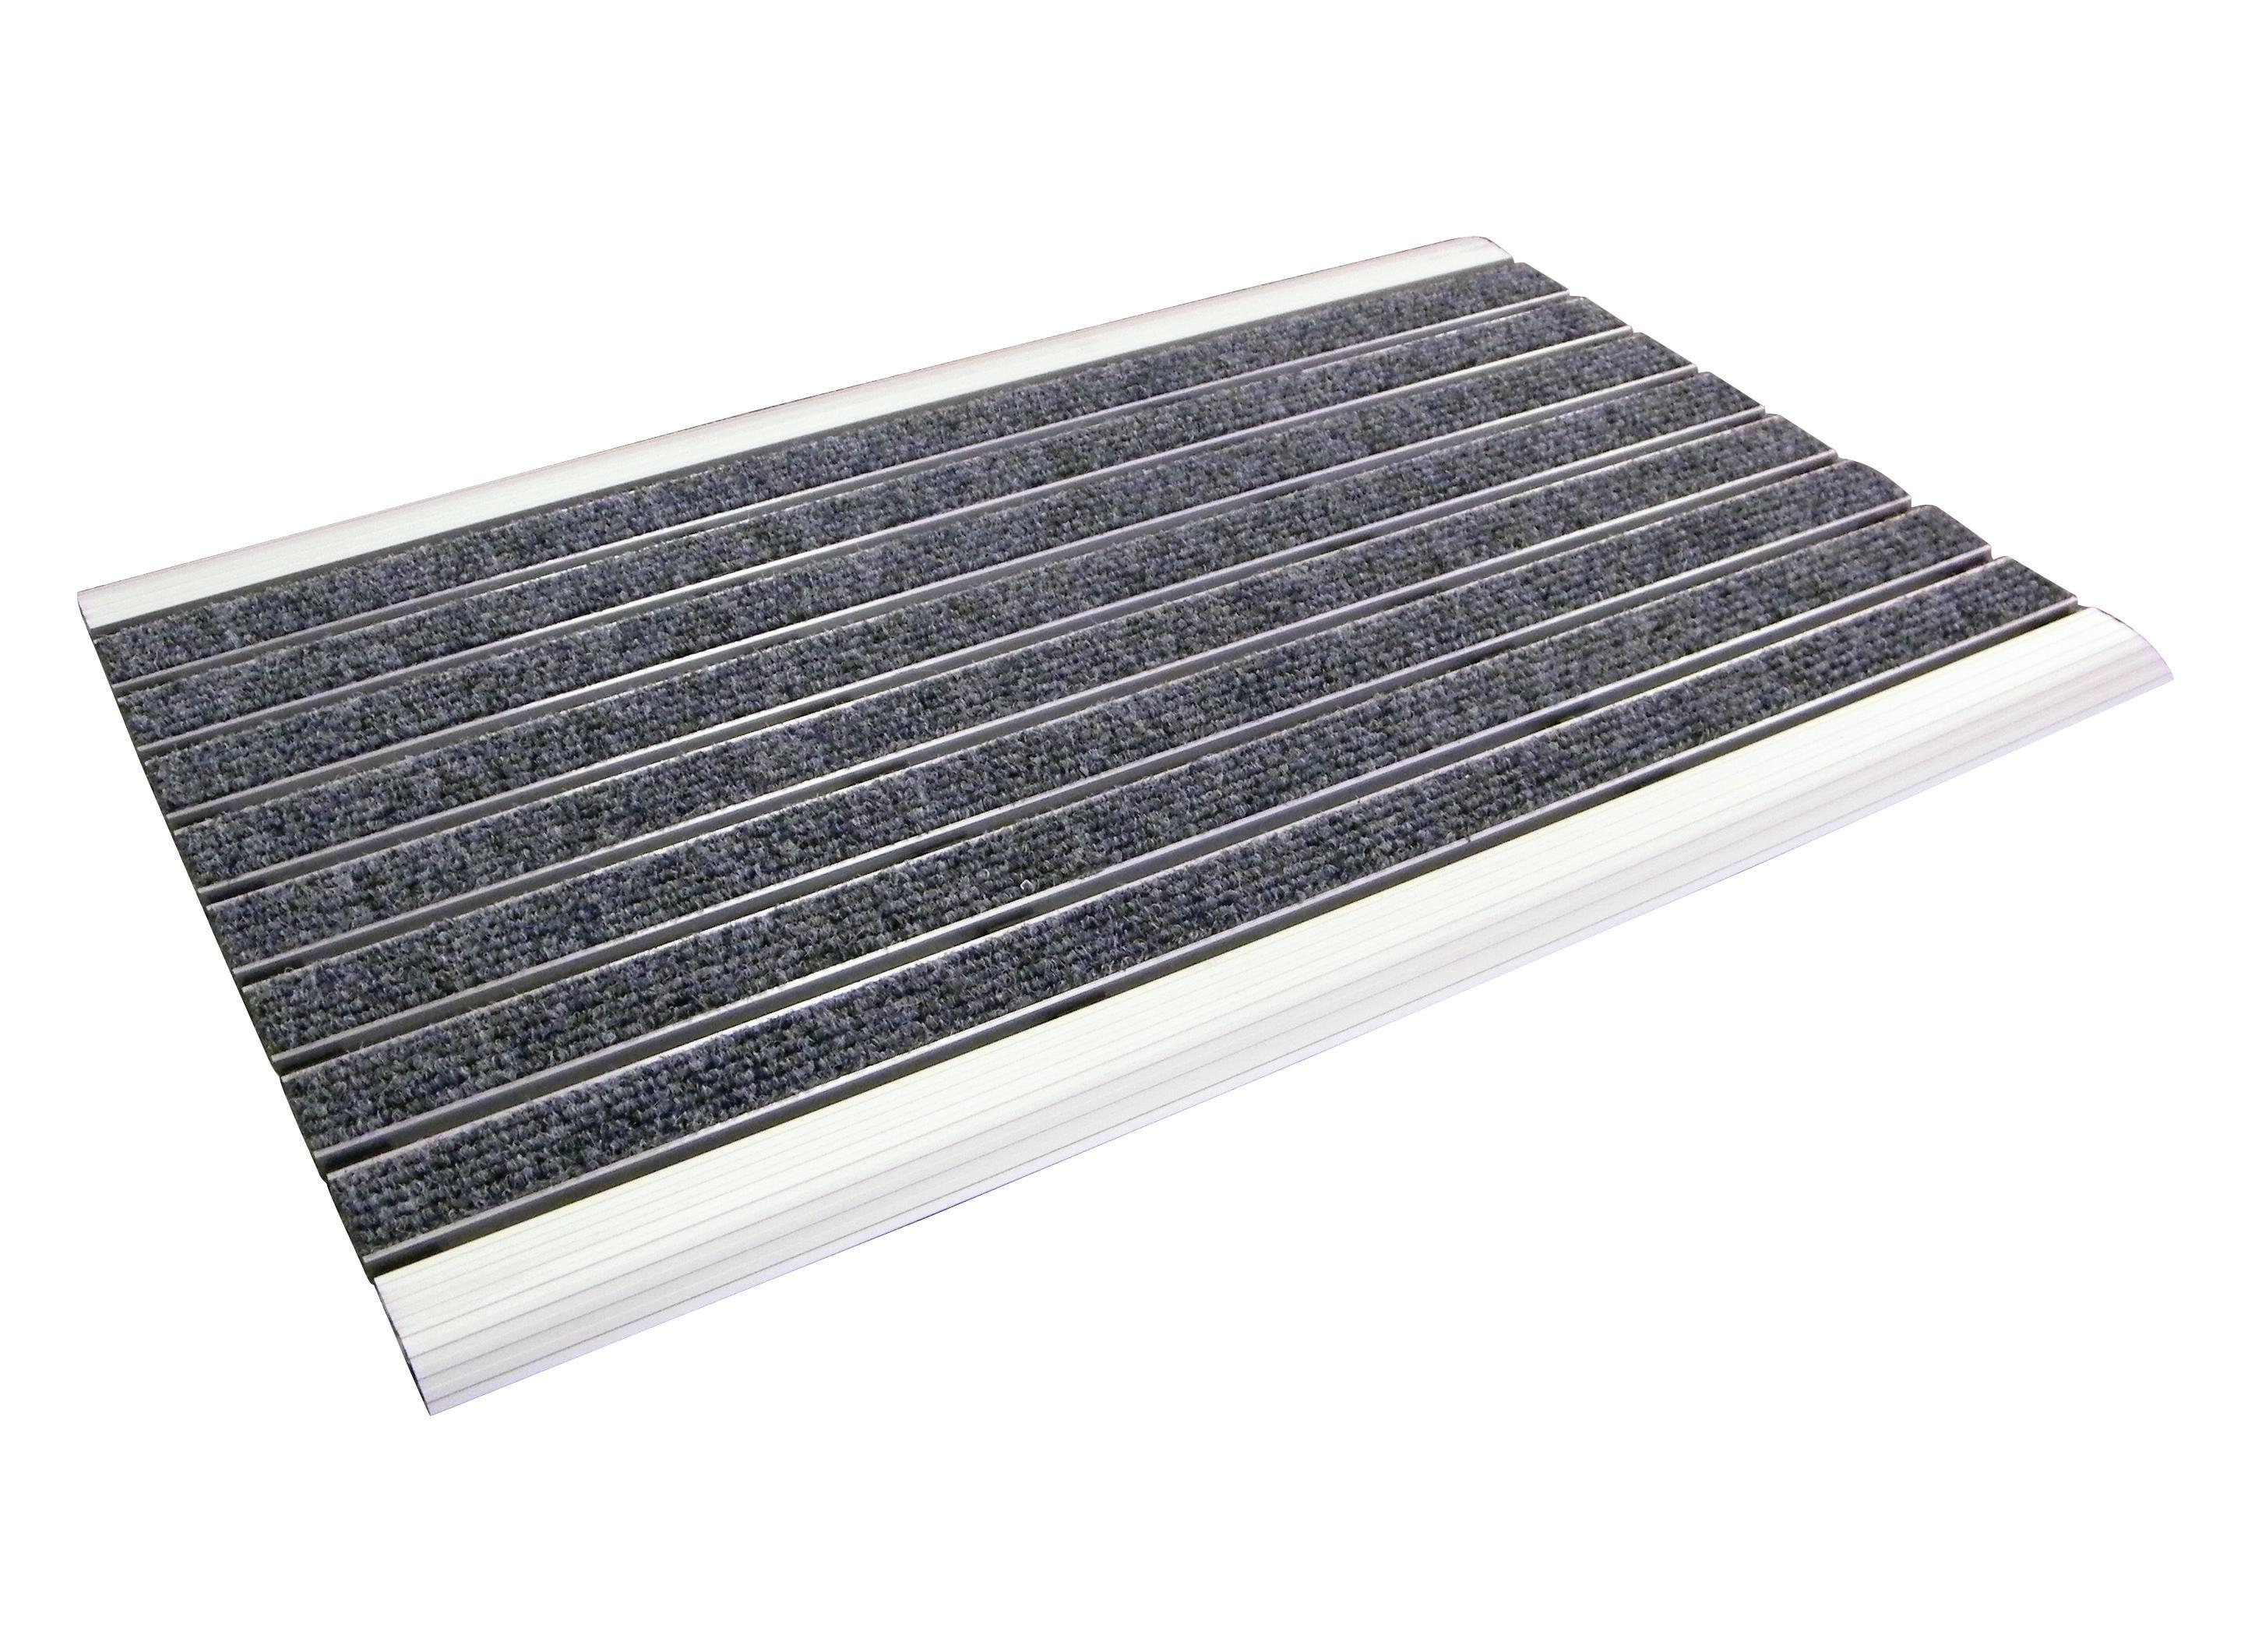 Doortex Alumat Aluminium Framed Door Mat For Indoor Use 390x600mm